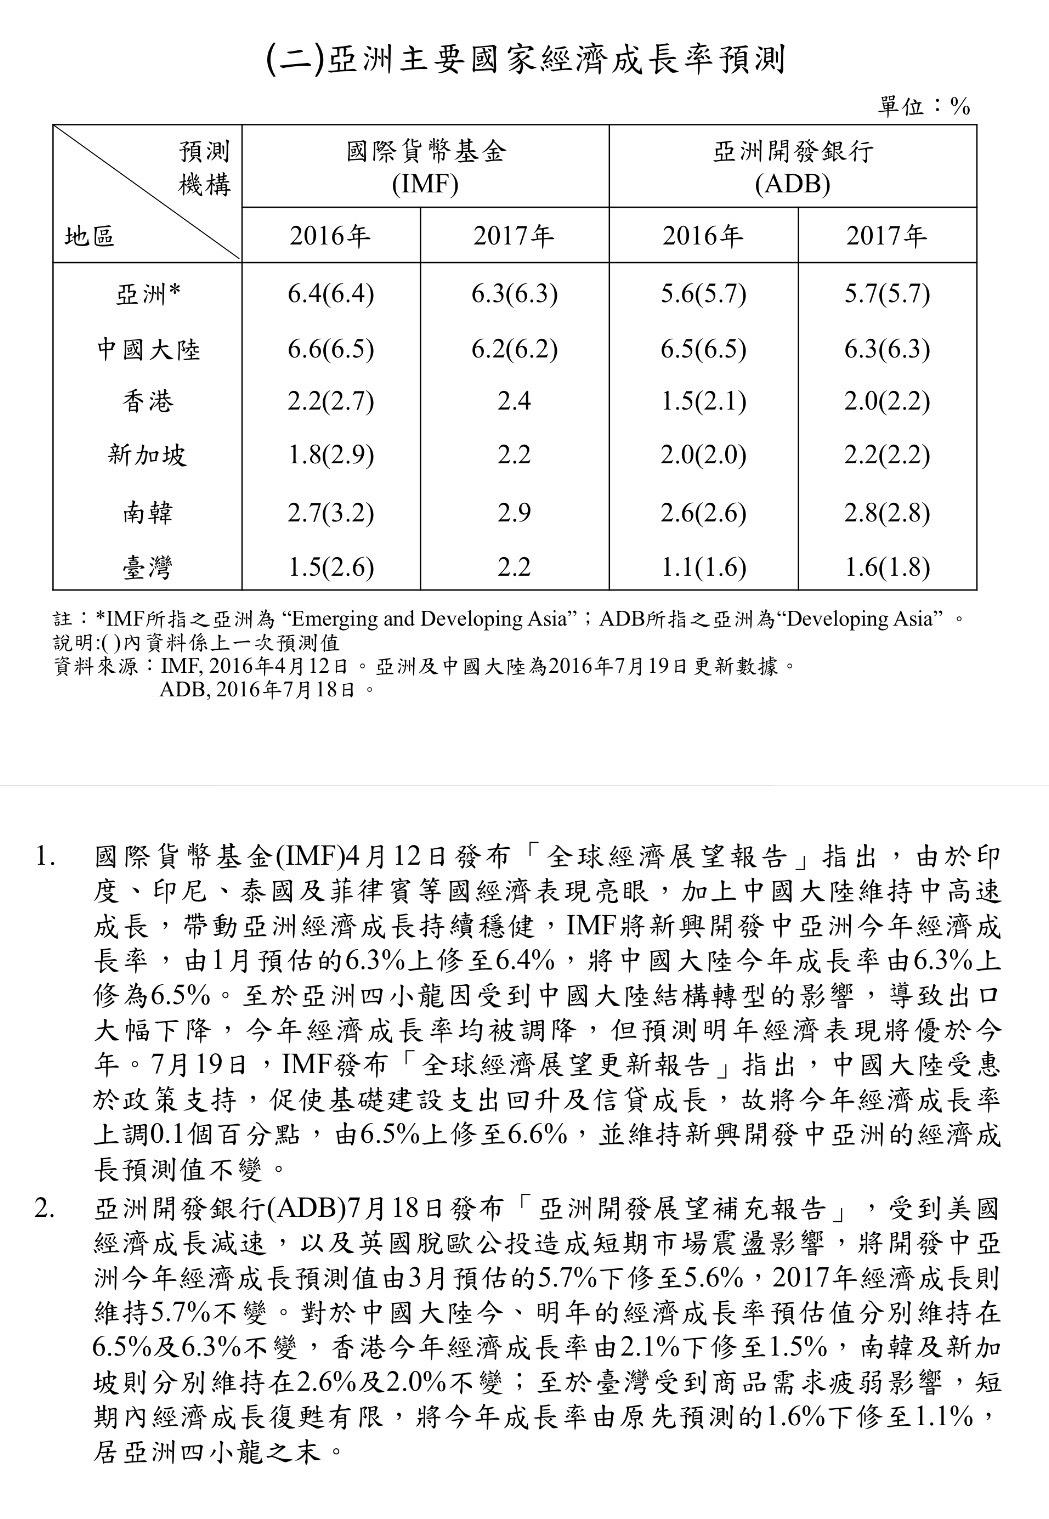 %e5%8f%b0%e7%81%a3%e7%b6%93%e6%bf%9f%e6%88%90%e9%95%b75